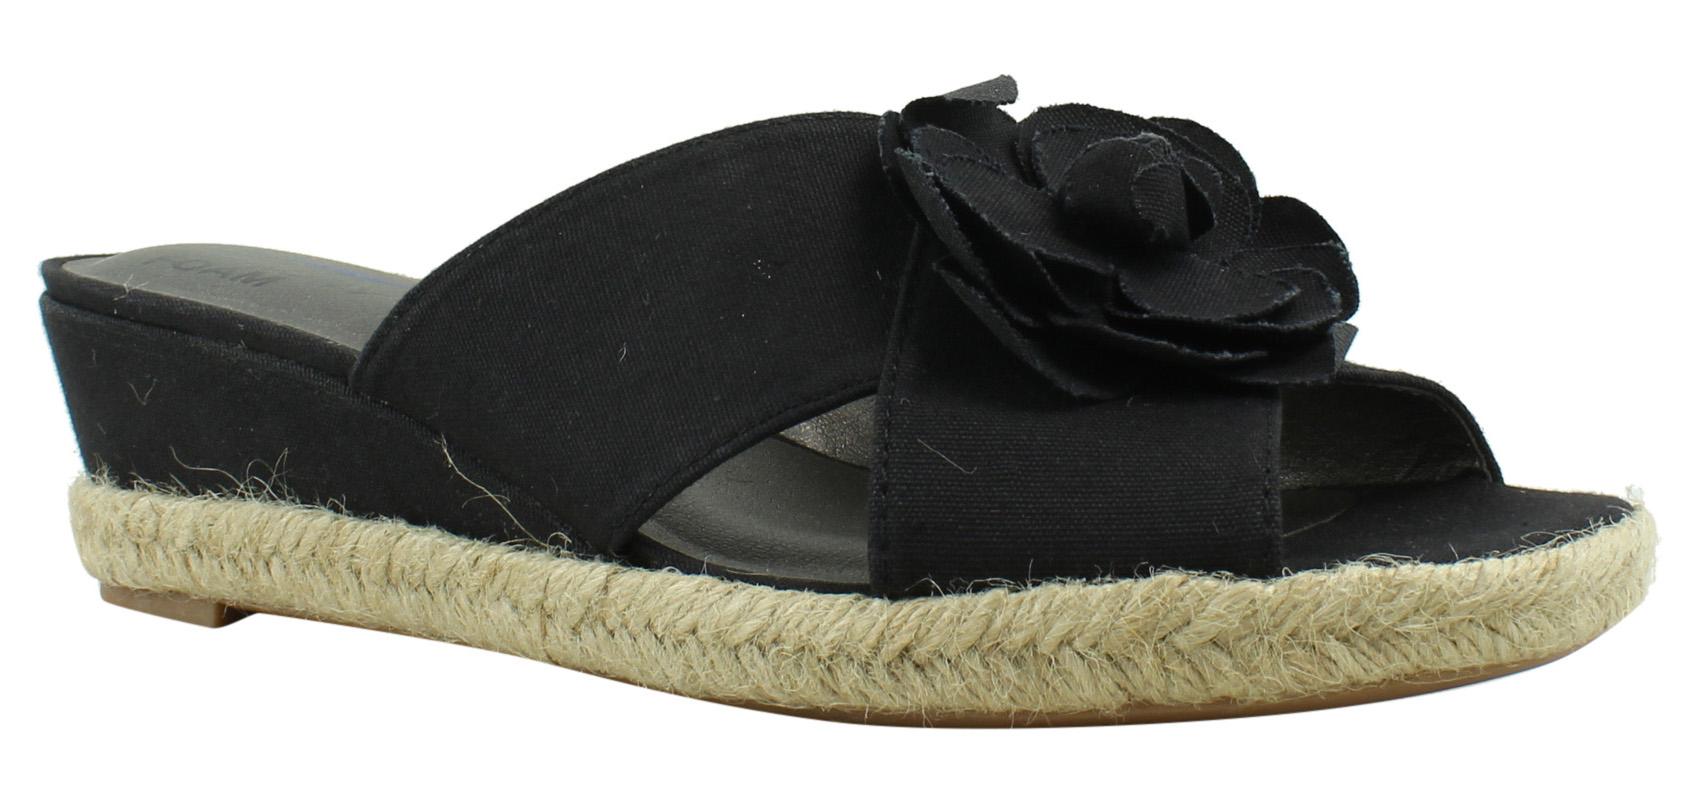 LifeStride Womens Sandals Black Sandals Womens Size 9 (424186) c11654